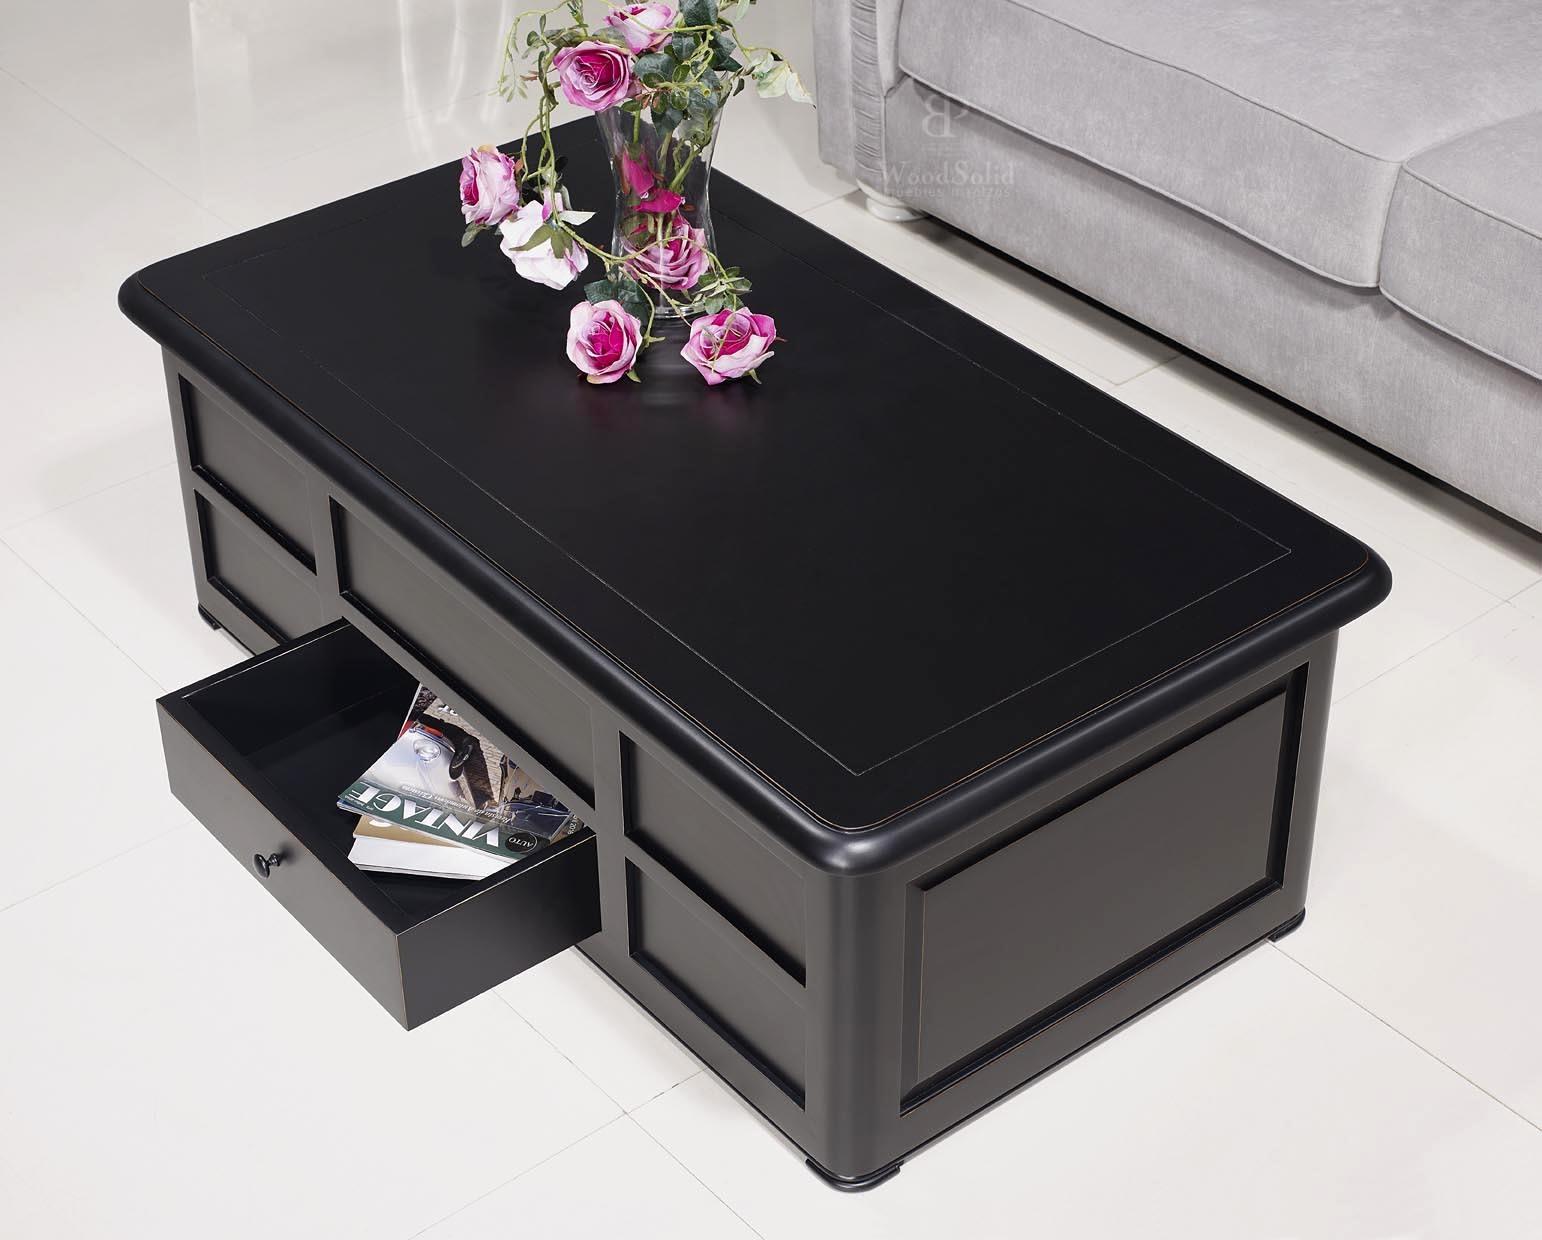 table basse bar ine en merisier de style louis philippe laqu noir meuble en merisier massif. Black Bedroom Furniture Sets. Home Design Ideas